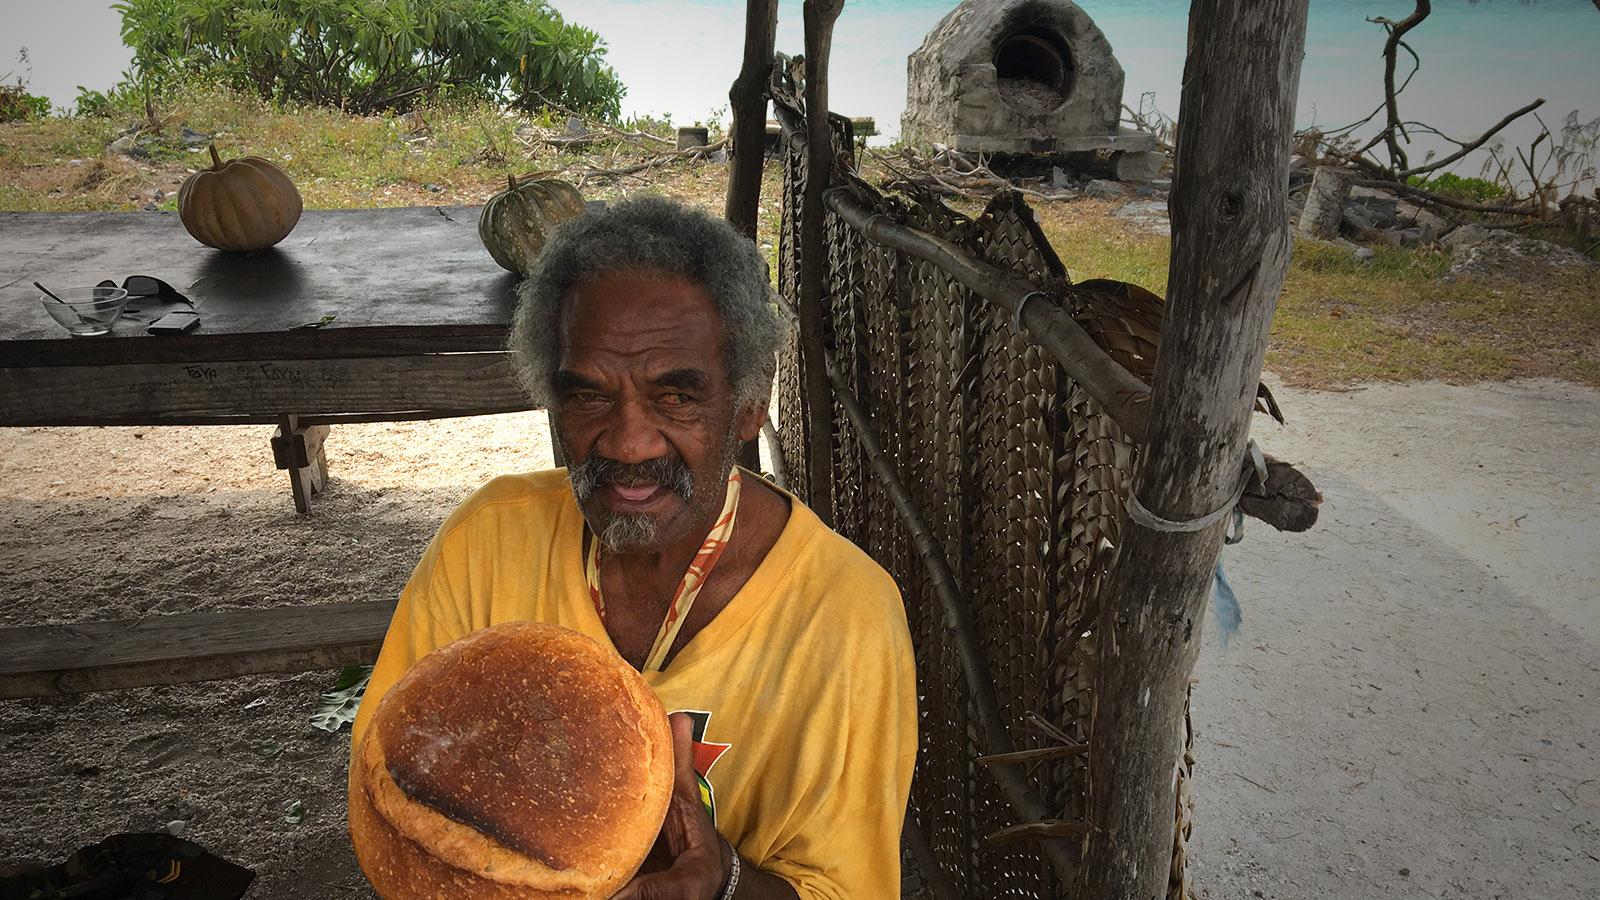 Direkt an der Inselhauptstraße verkauft dieser Bäcker Holzofenbrote. Foto: Hilke Maunder